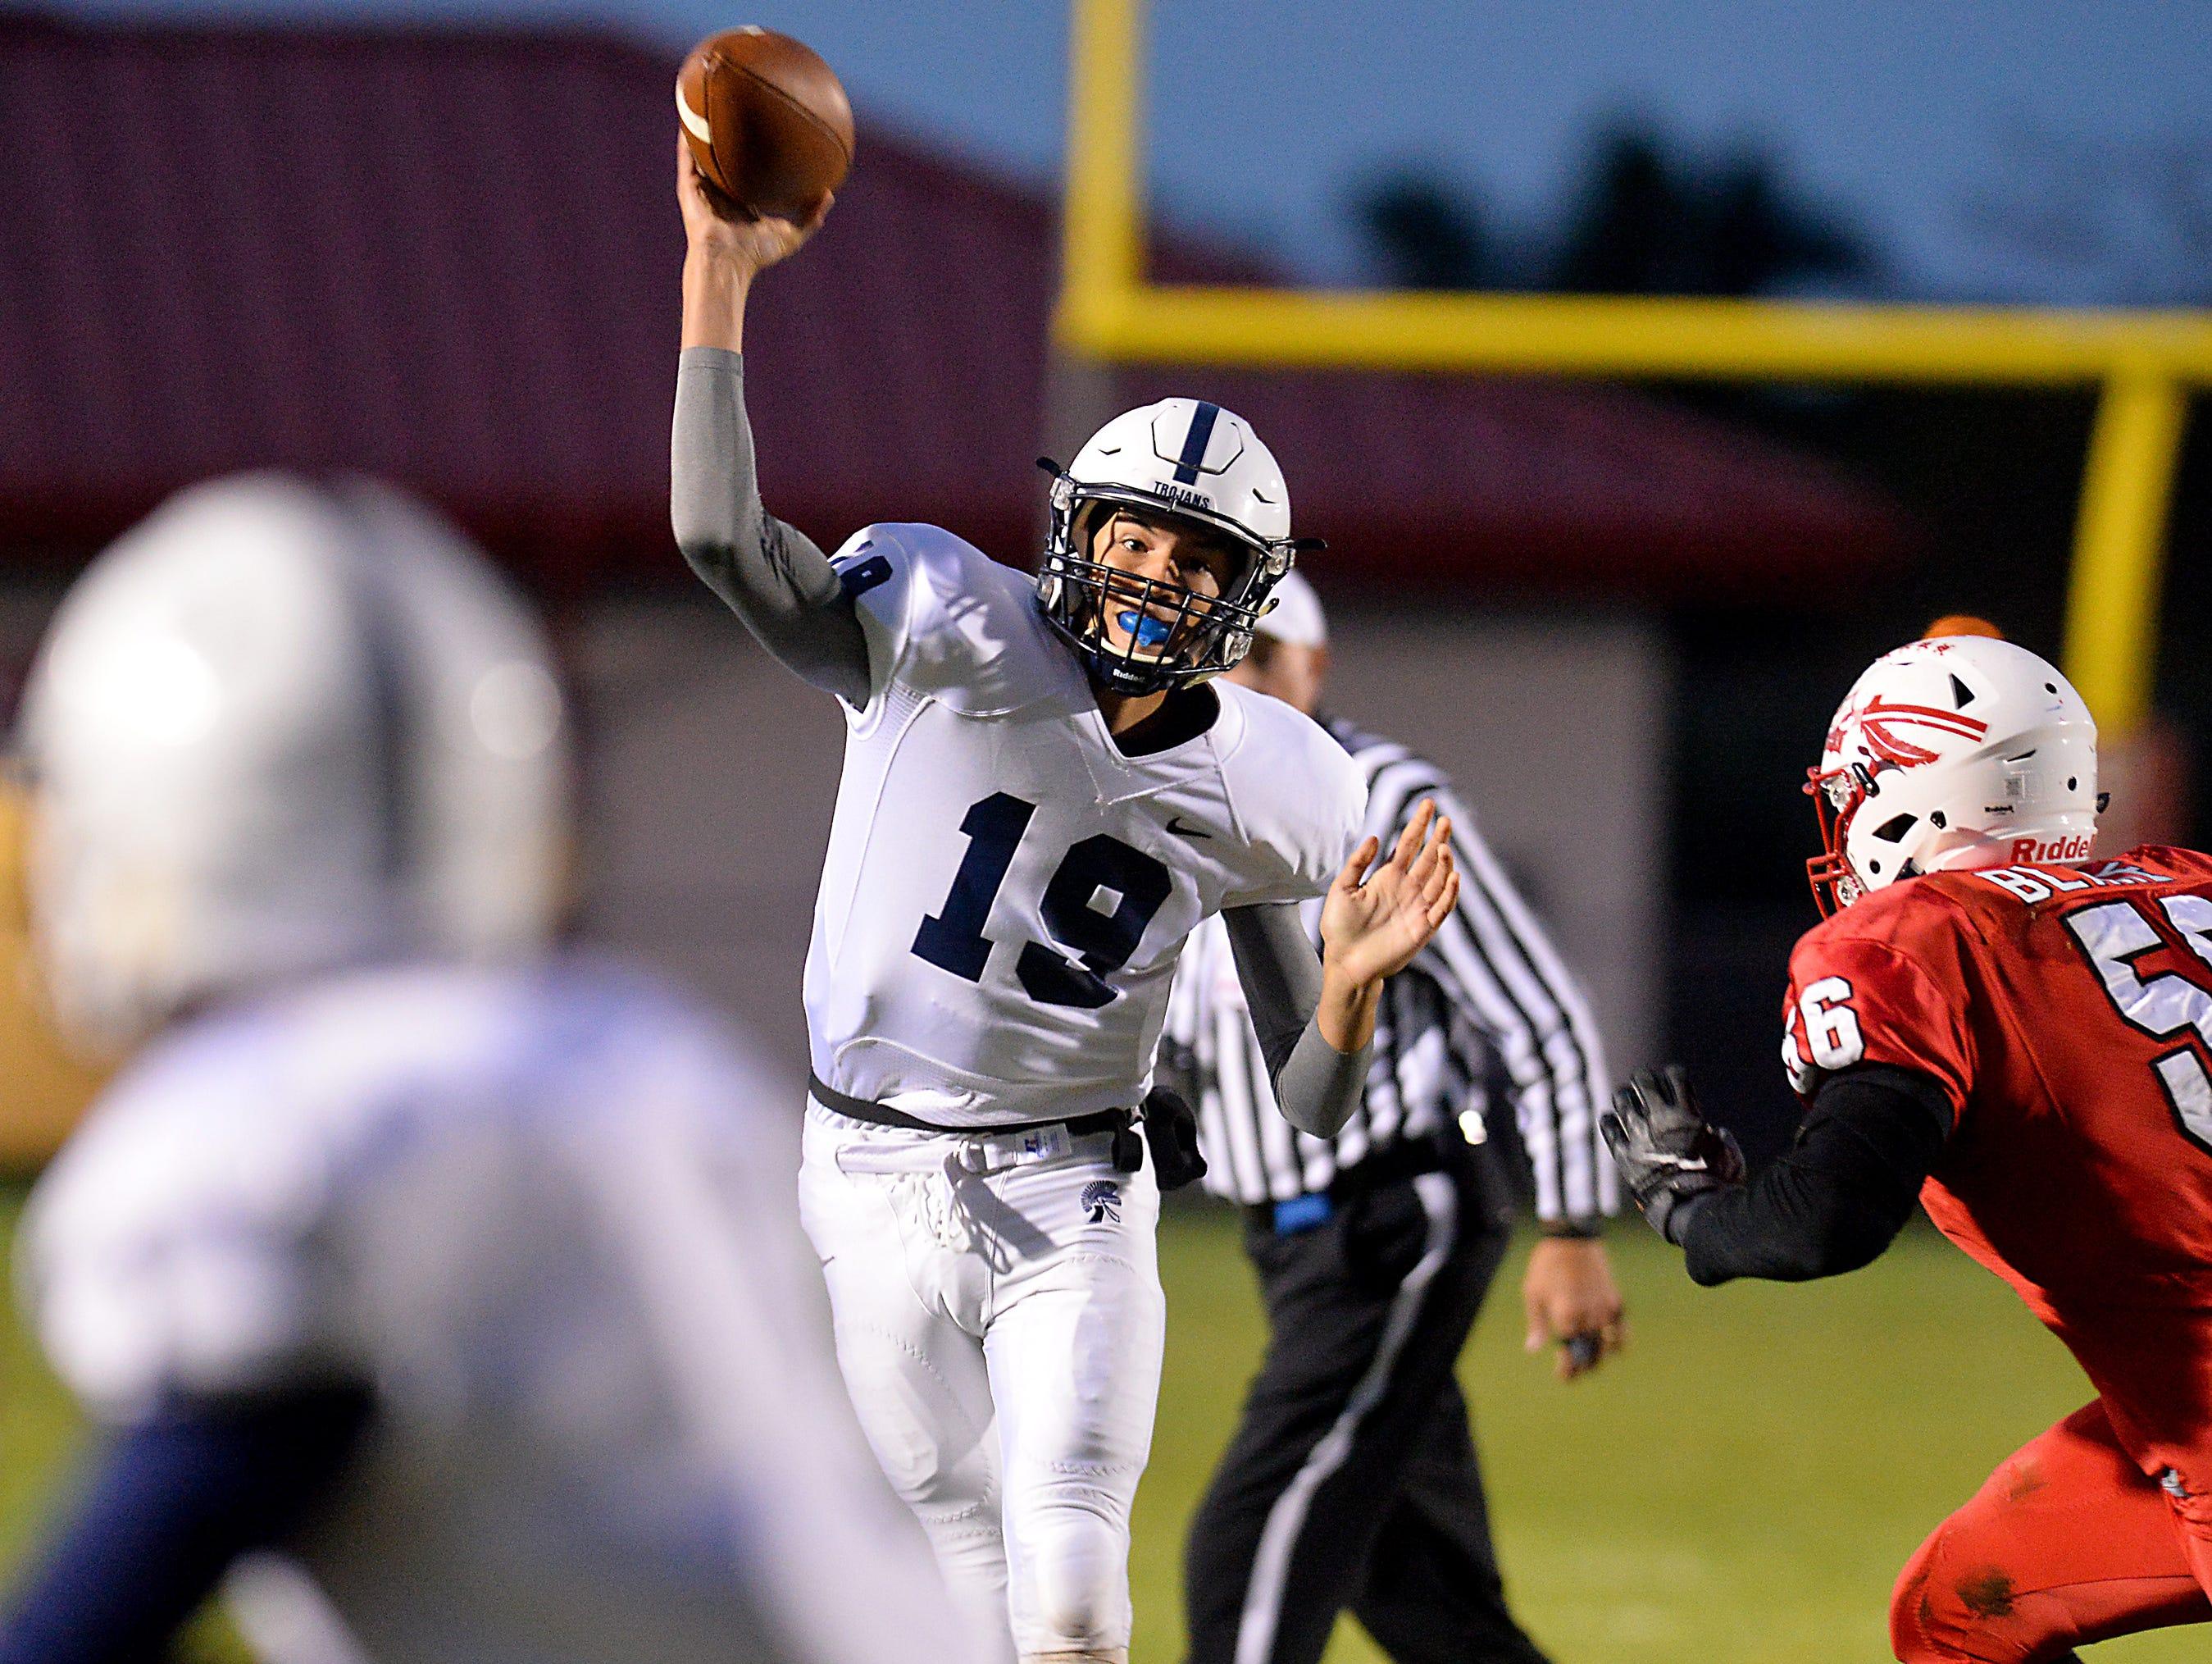 East Lansing quarterback Hunter Helmic passes as Sexton defender Marshon Blake, right, closes in at Sexton Friday.